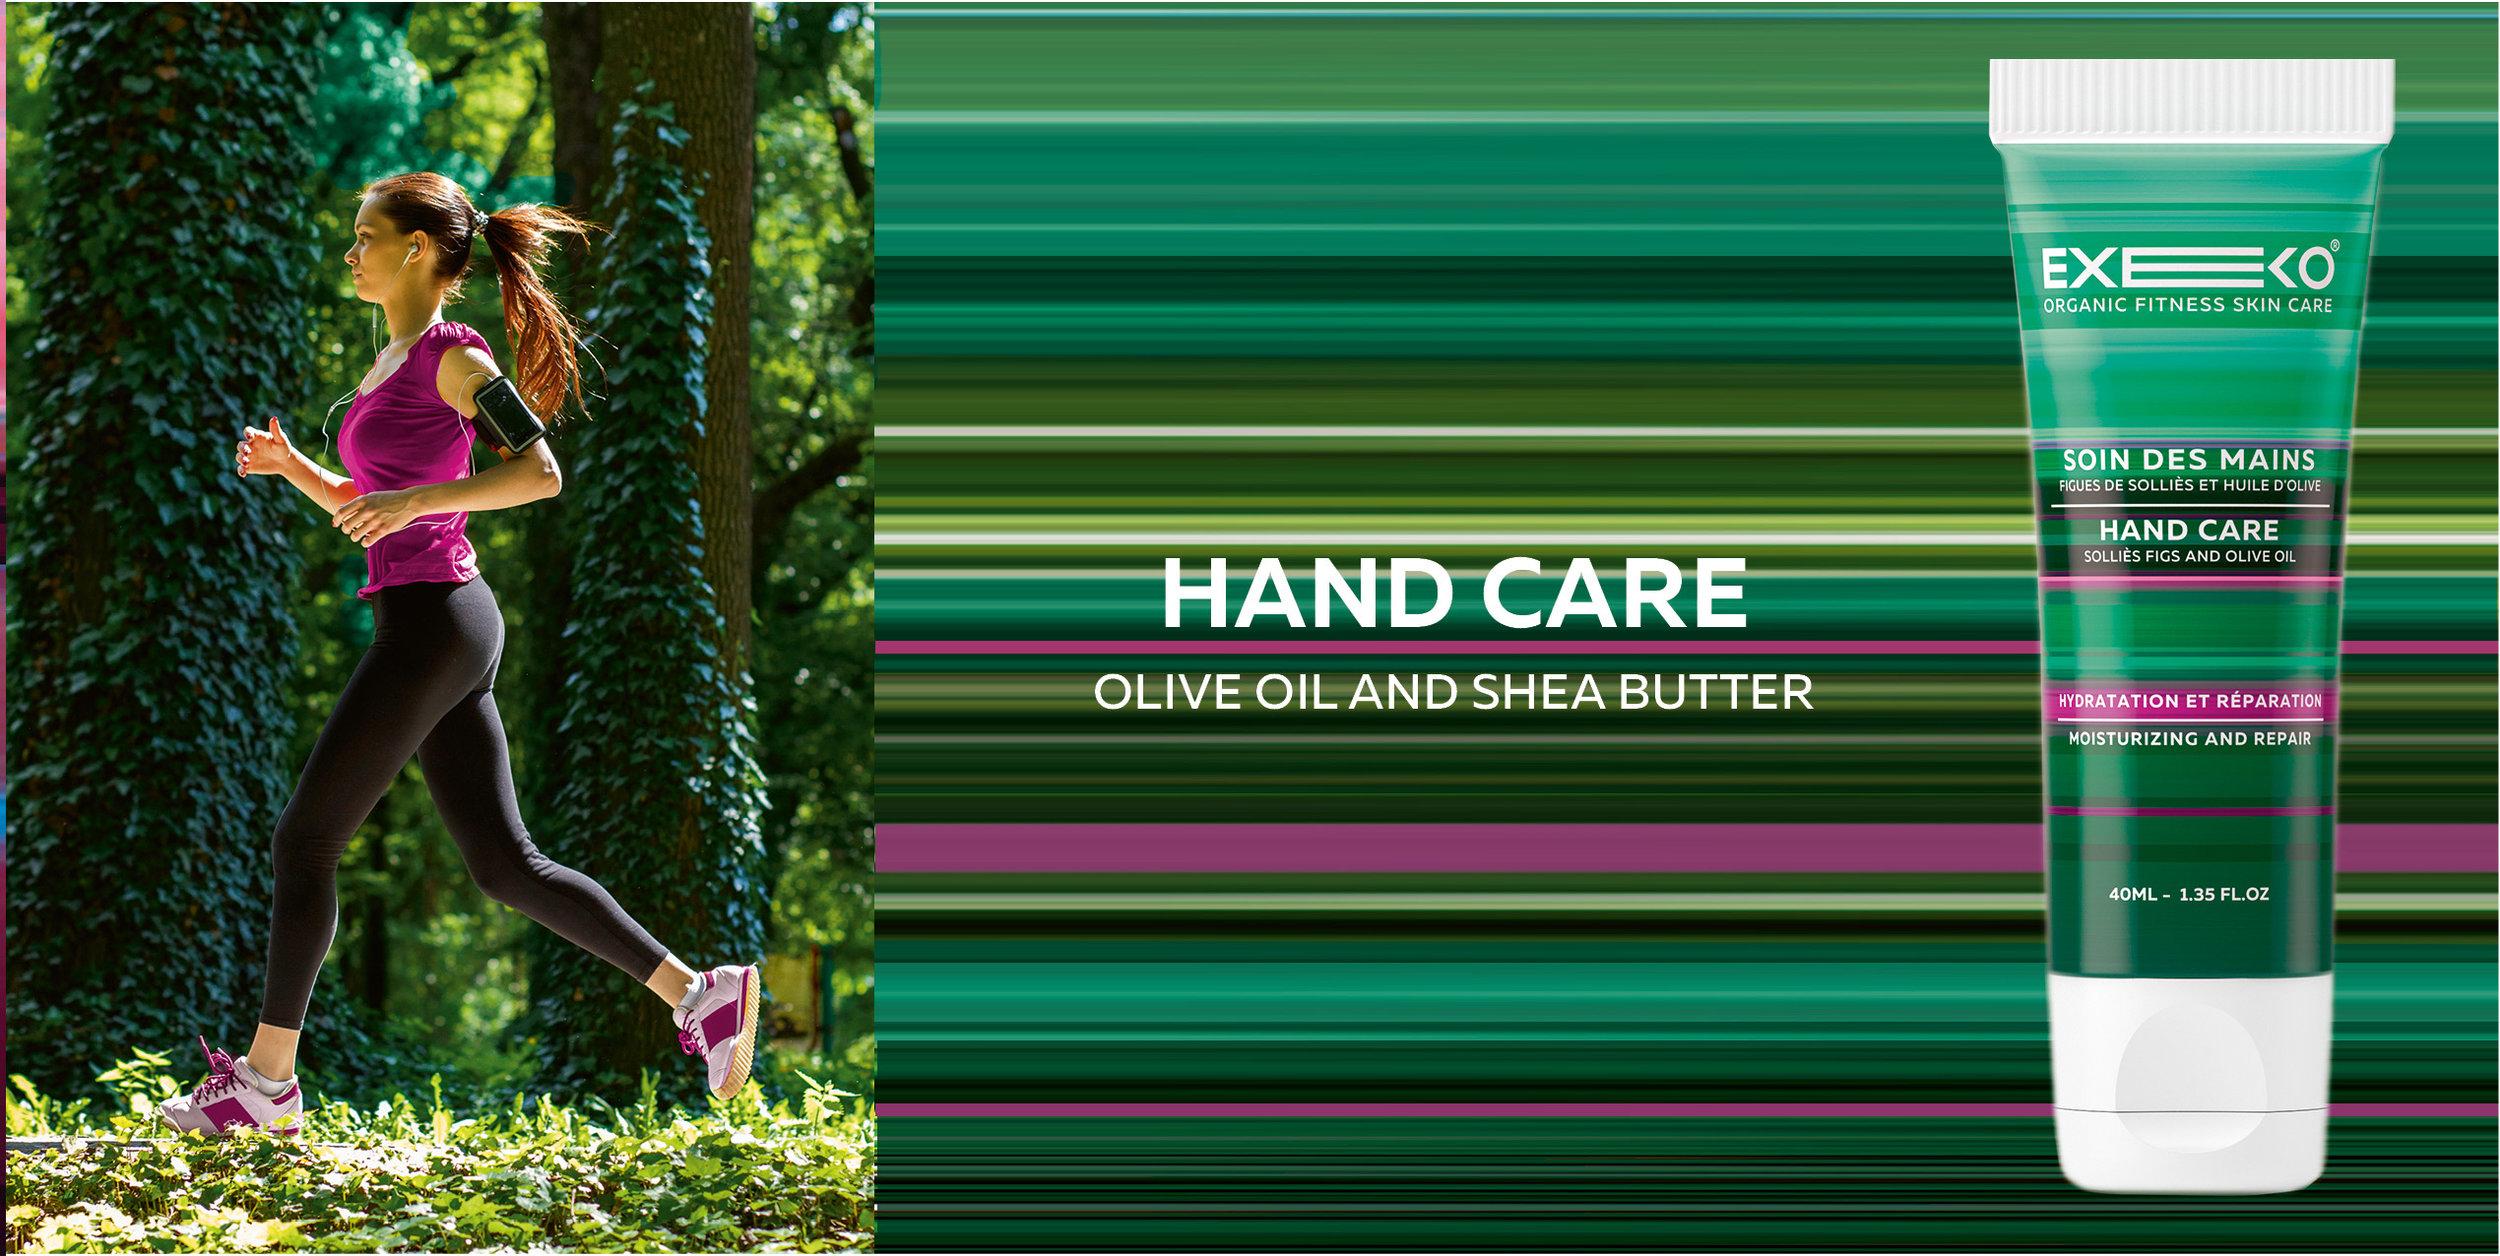 EXEKO - Organic Fitness Skin Care from Paris BRAND DESIGN